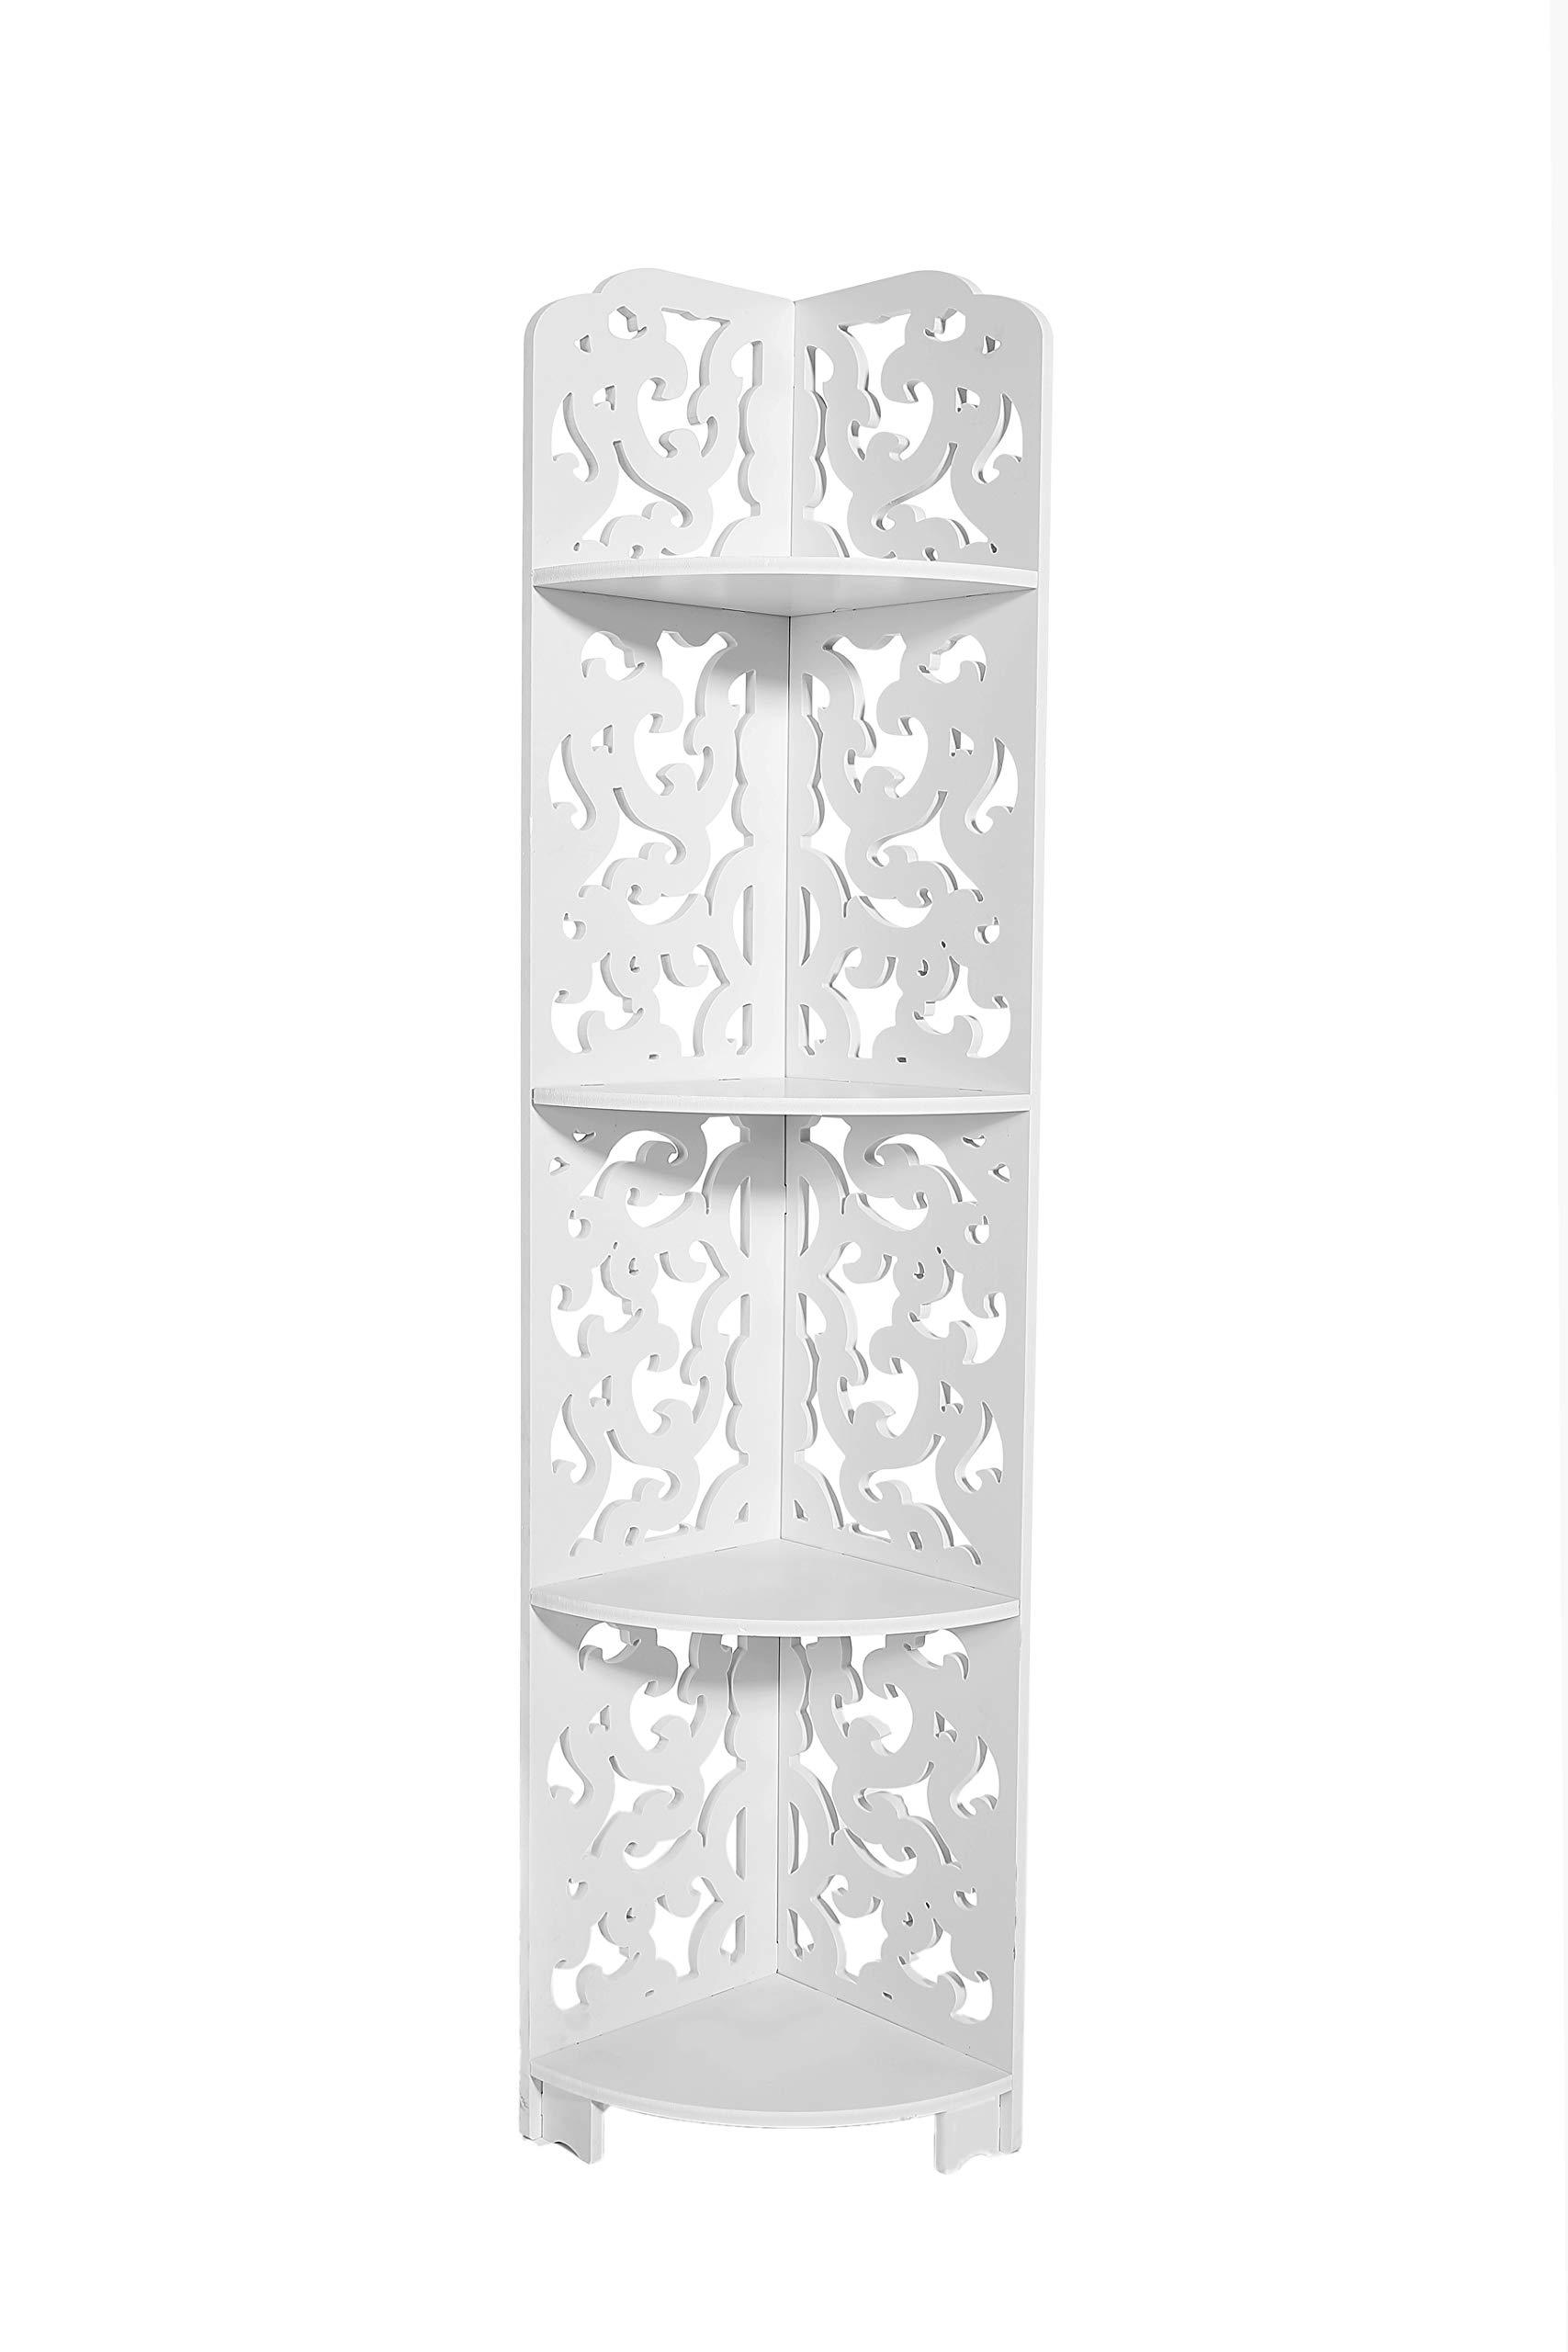 Dline -4 Tires Wood-Plastic Composites Corner Shelf, White 4C